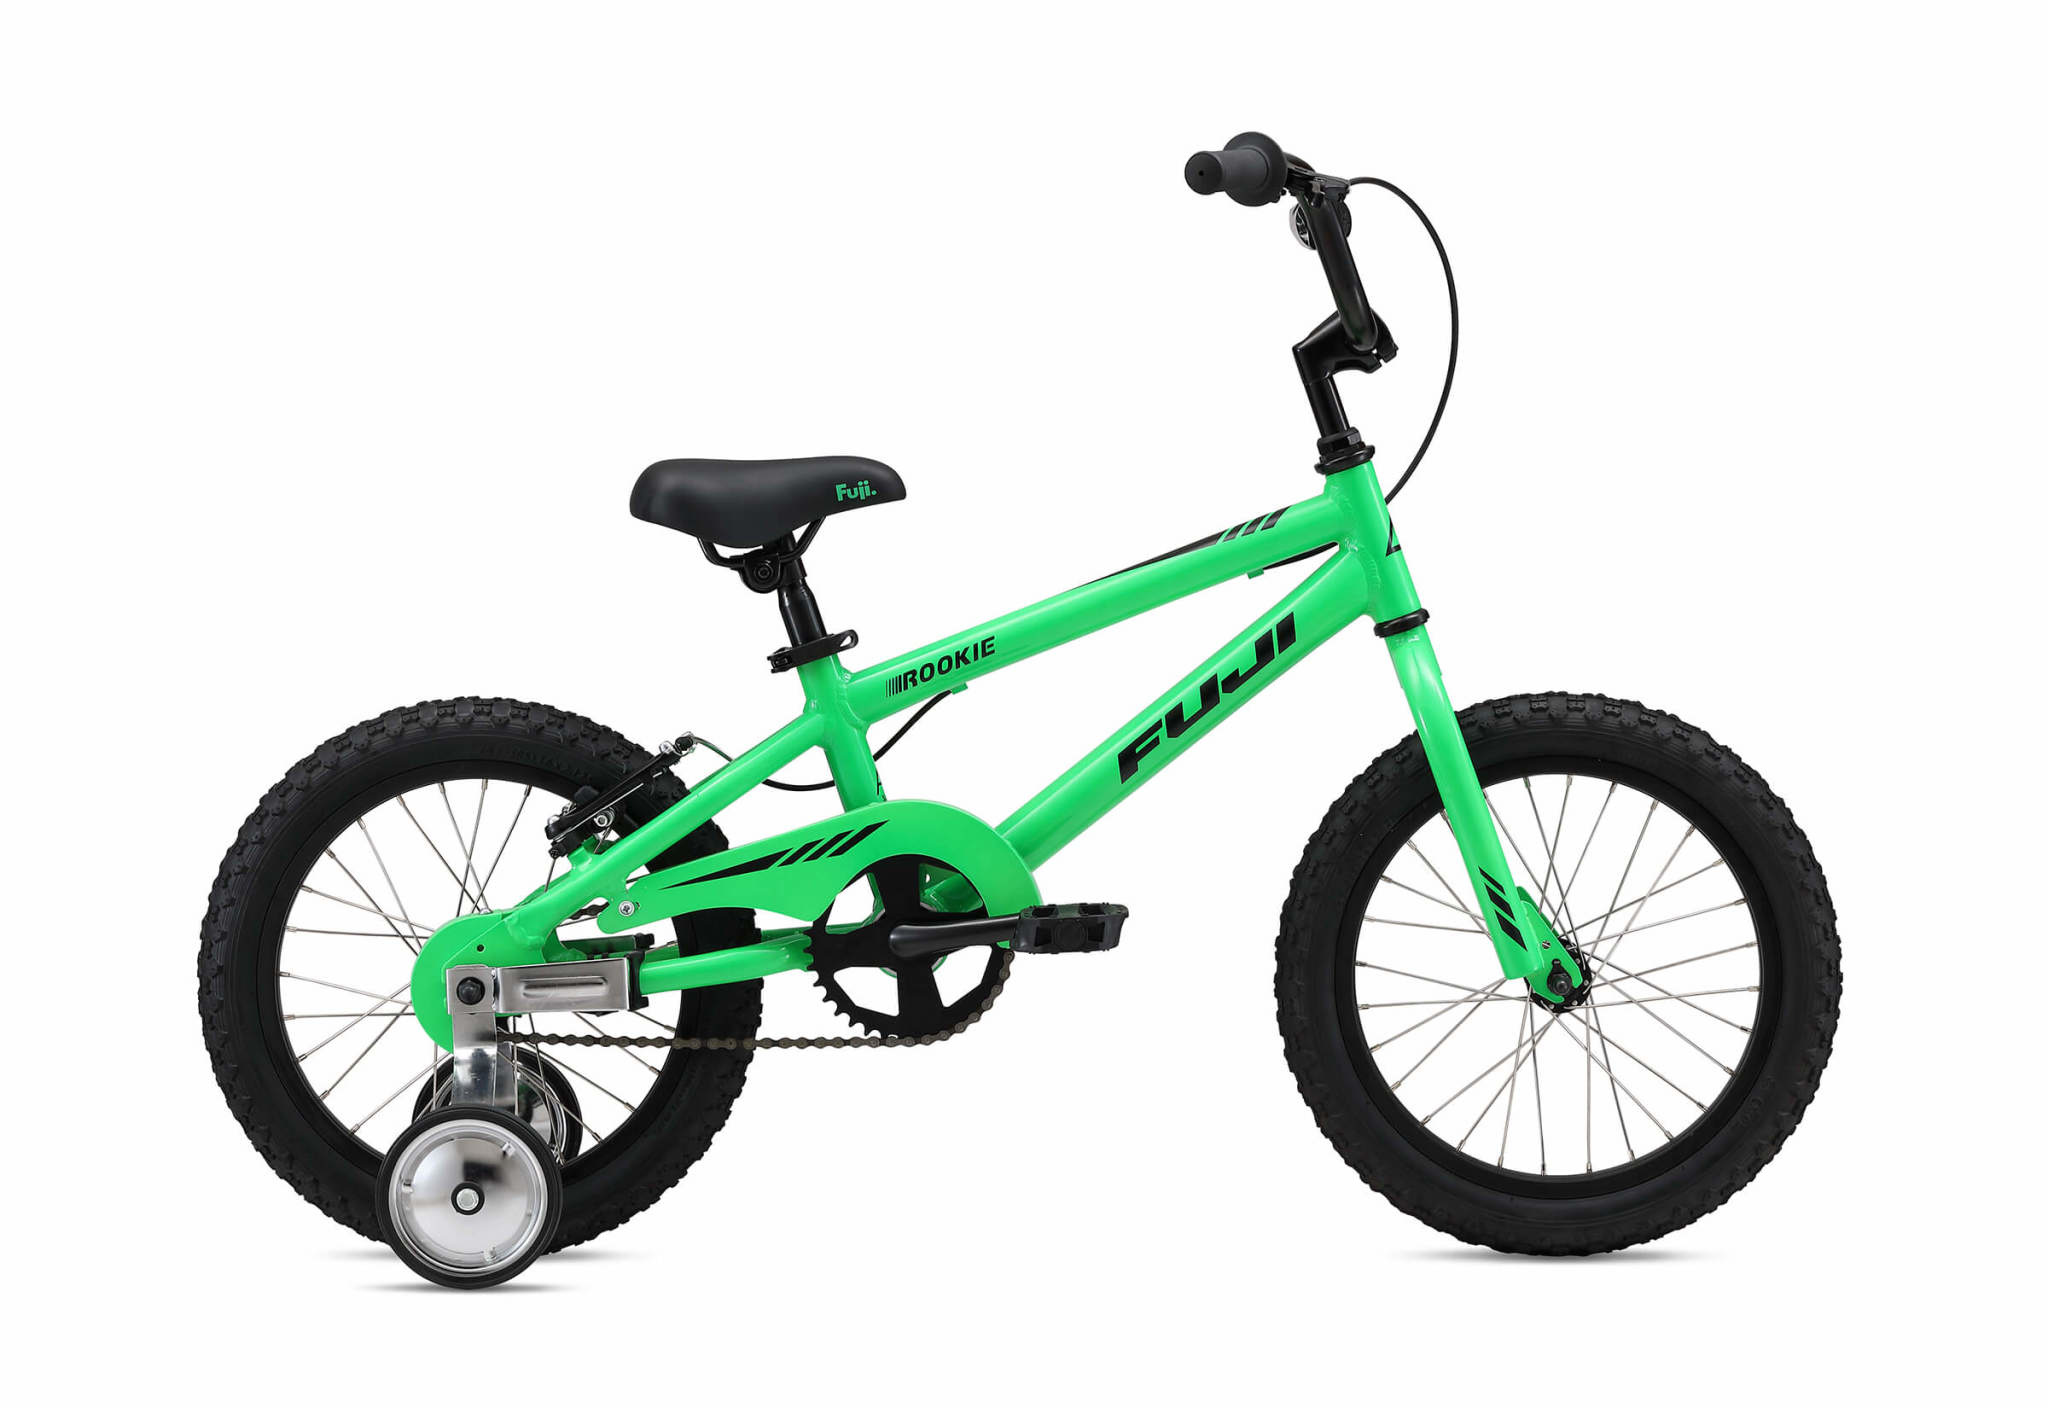 Fuji Rookie 16 Green